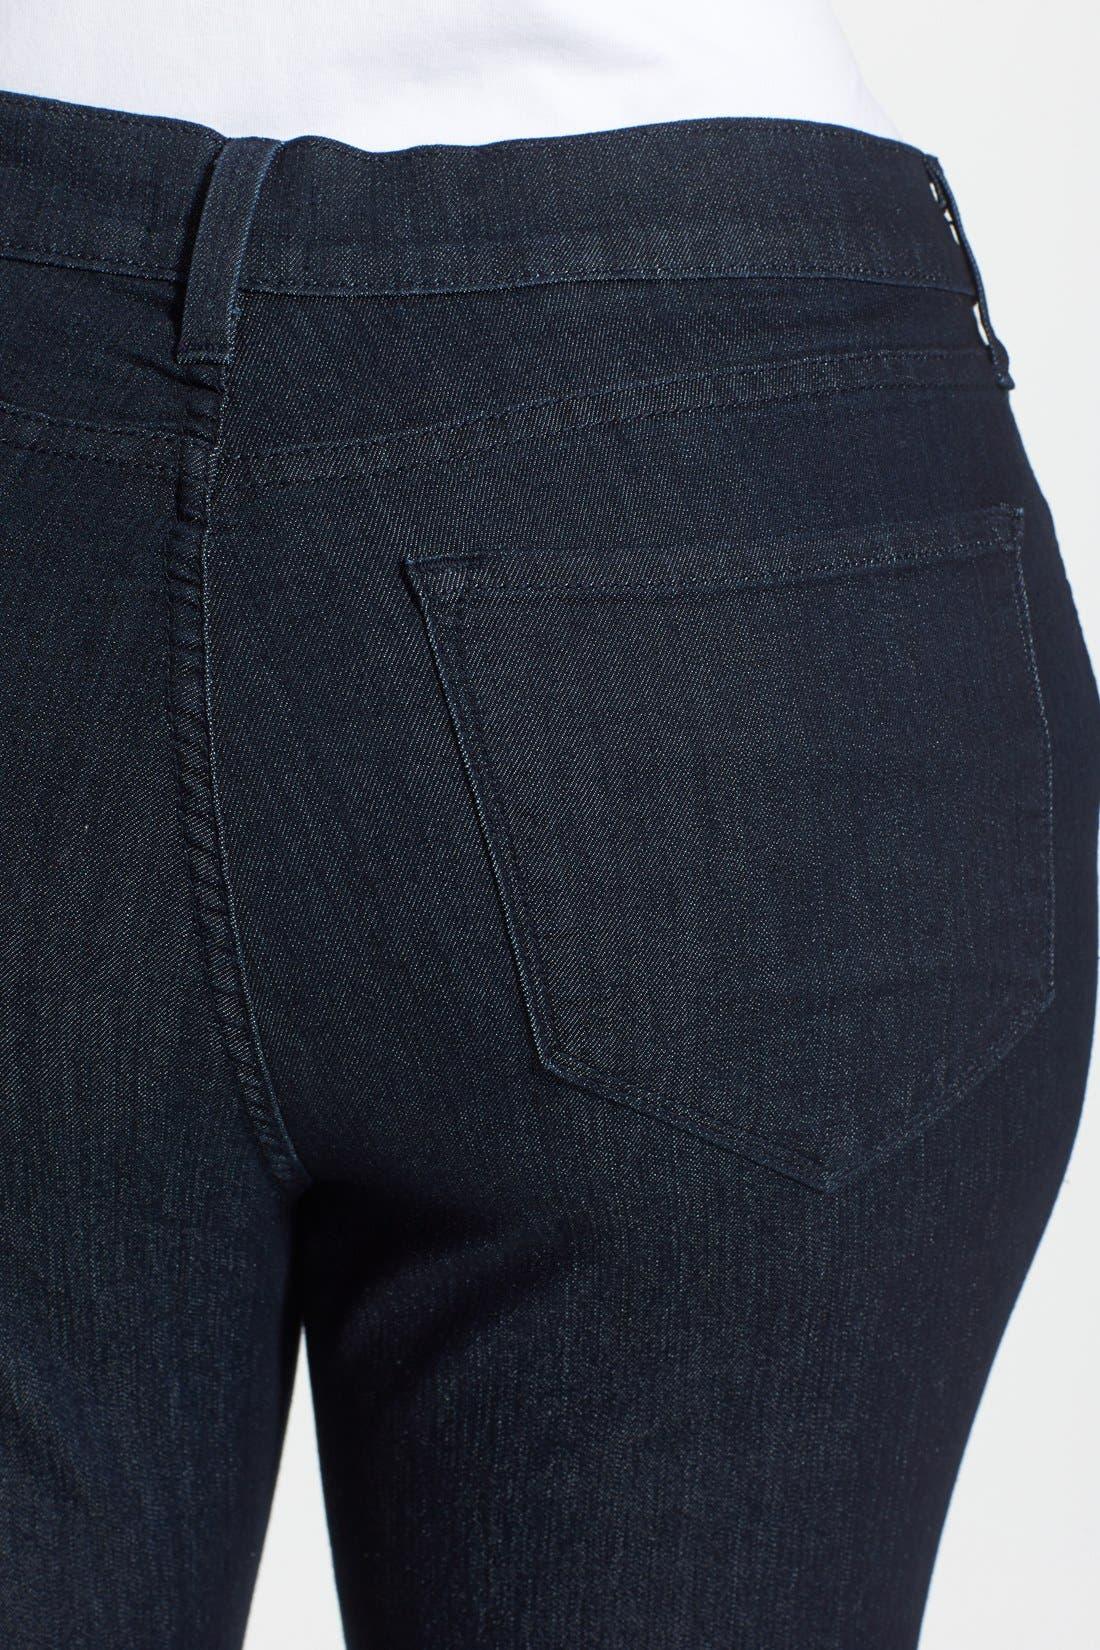 Alternate Image 3  - KUT from the Kloth 'Diana' Stretch Skinny Jeans (Discrete) (Plus Size)